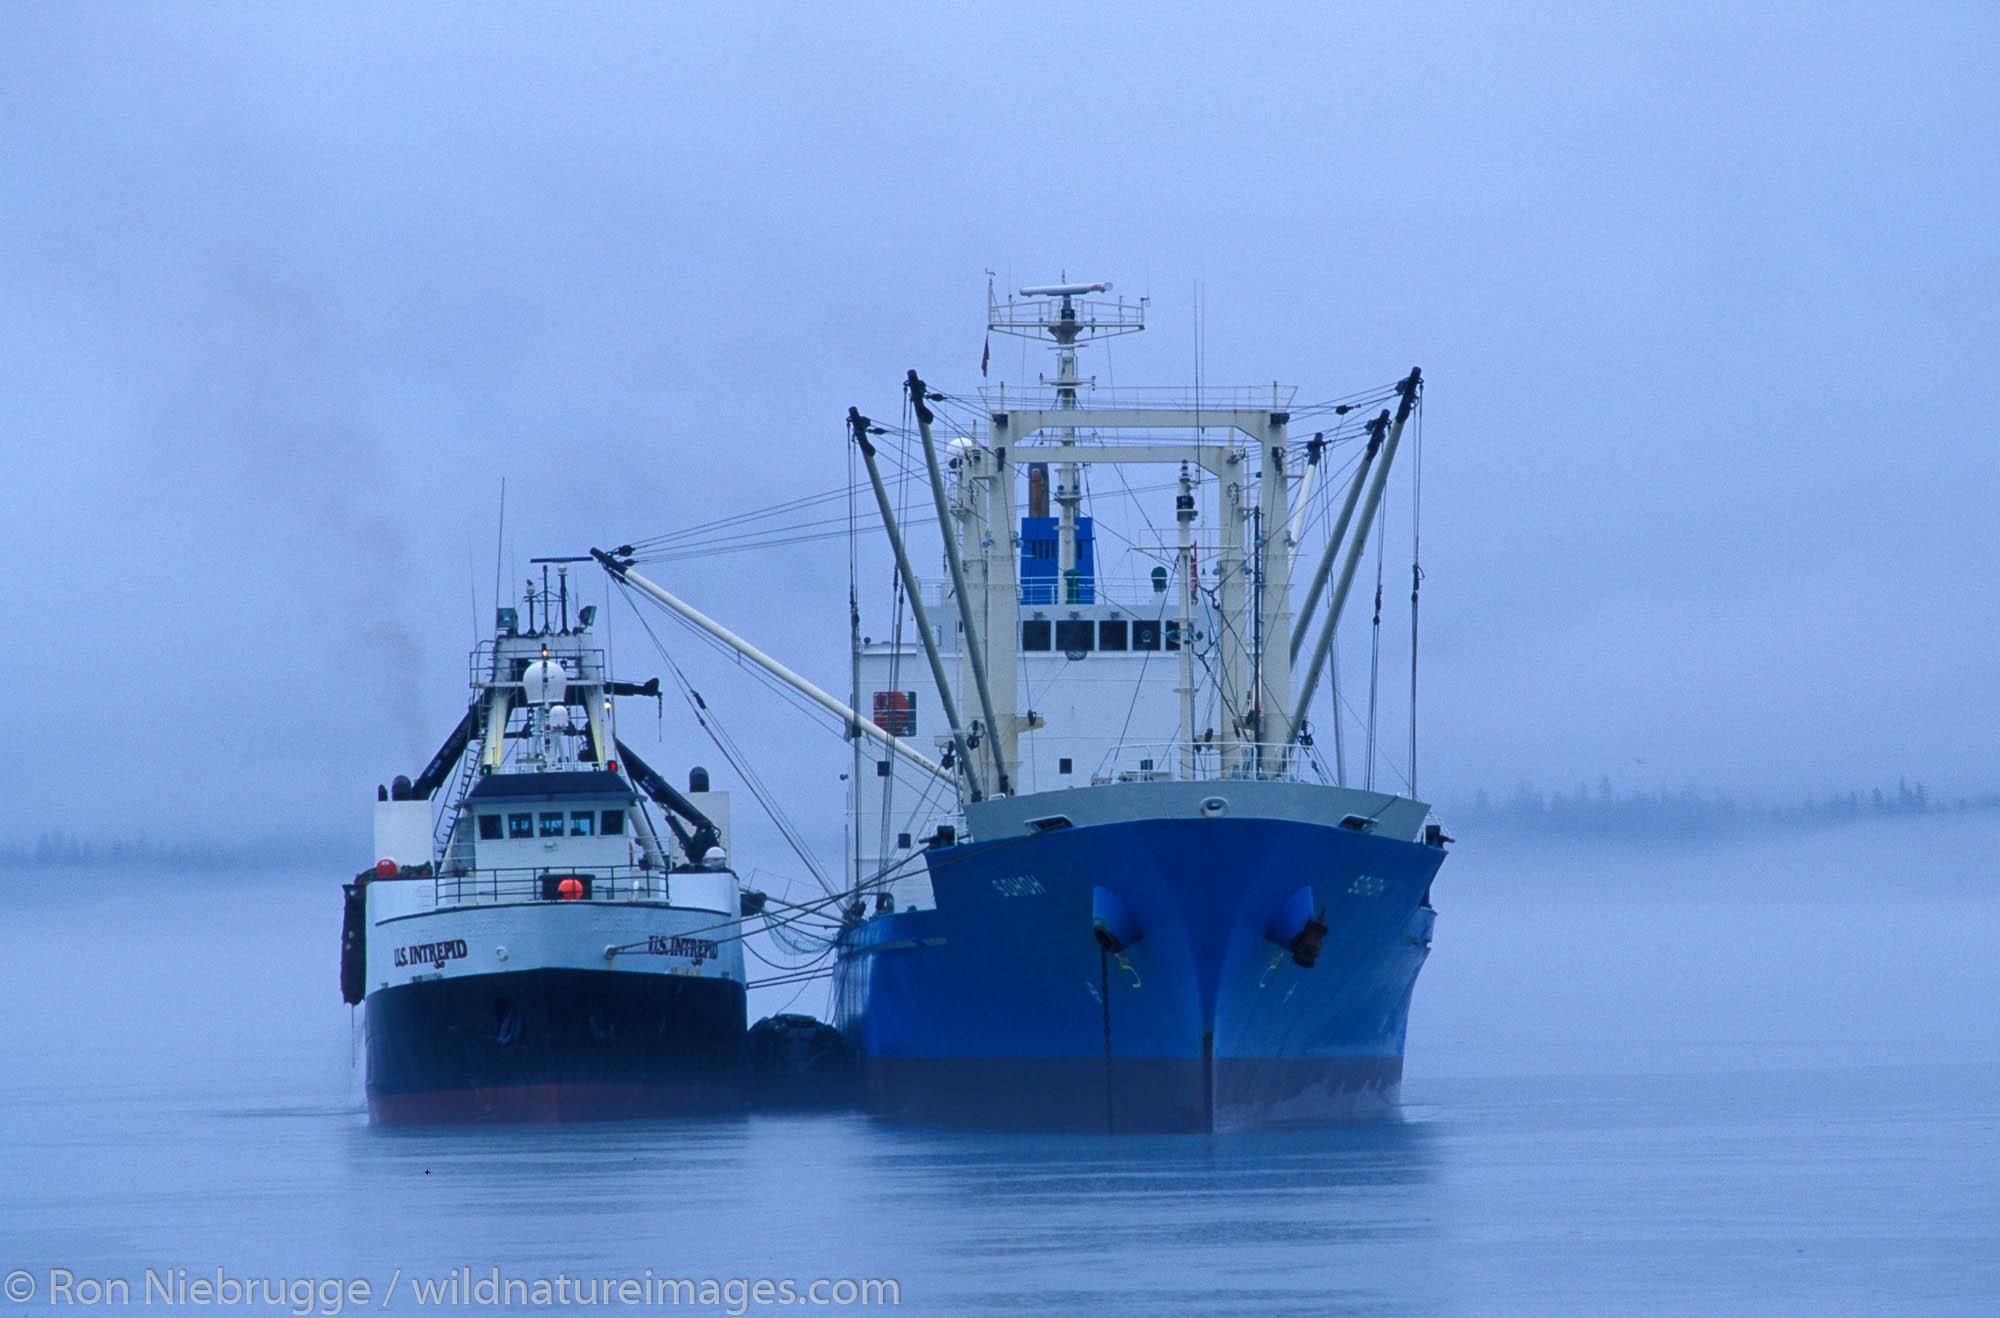 The US Intrepid unloading fish on to the tramper Sohoh, in Resurrection Bay, Seward, Alaska.